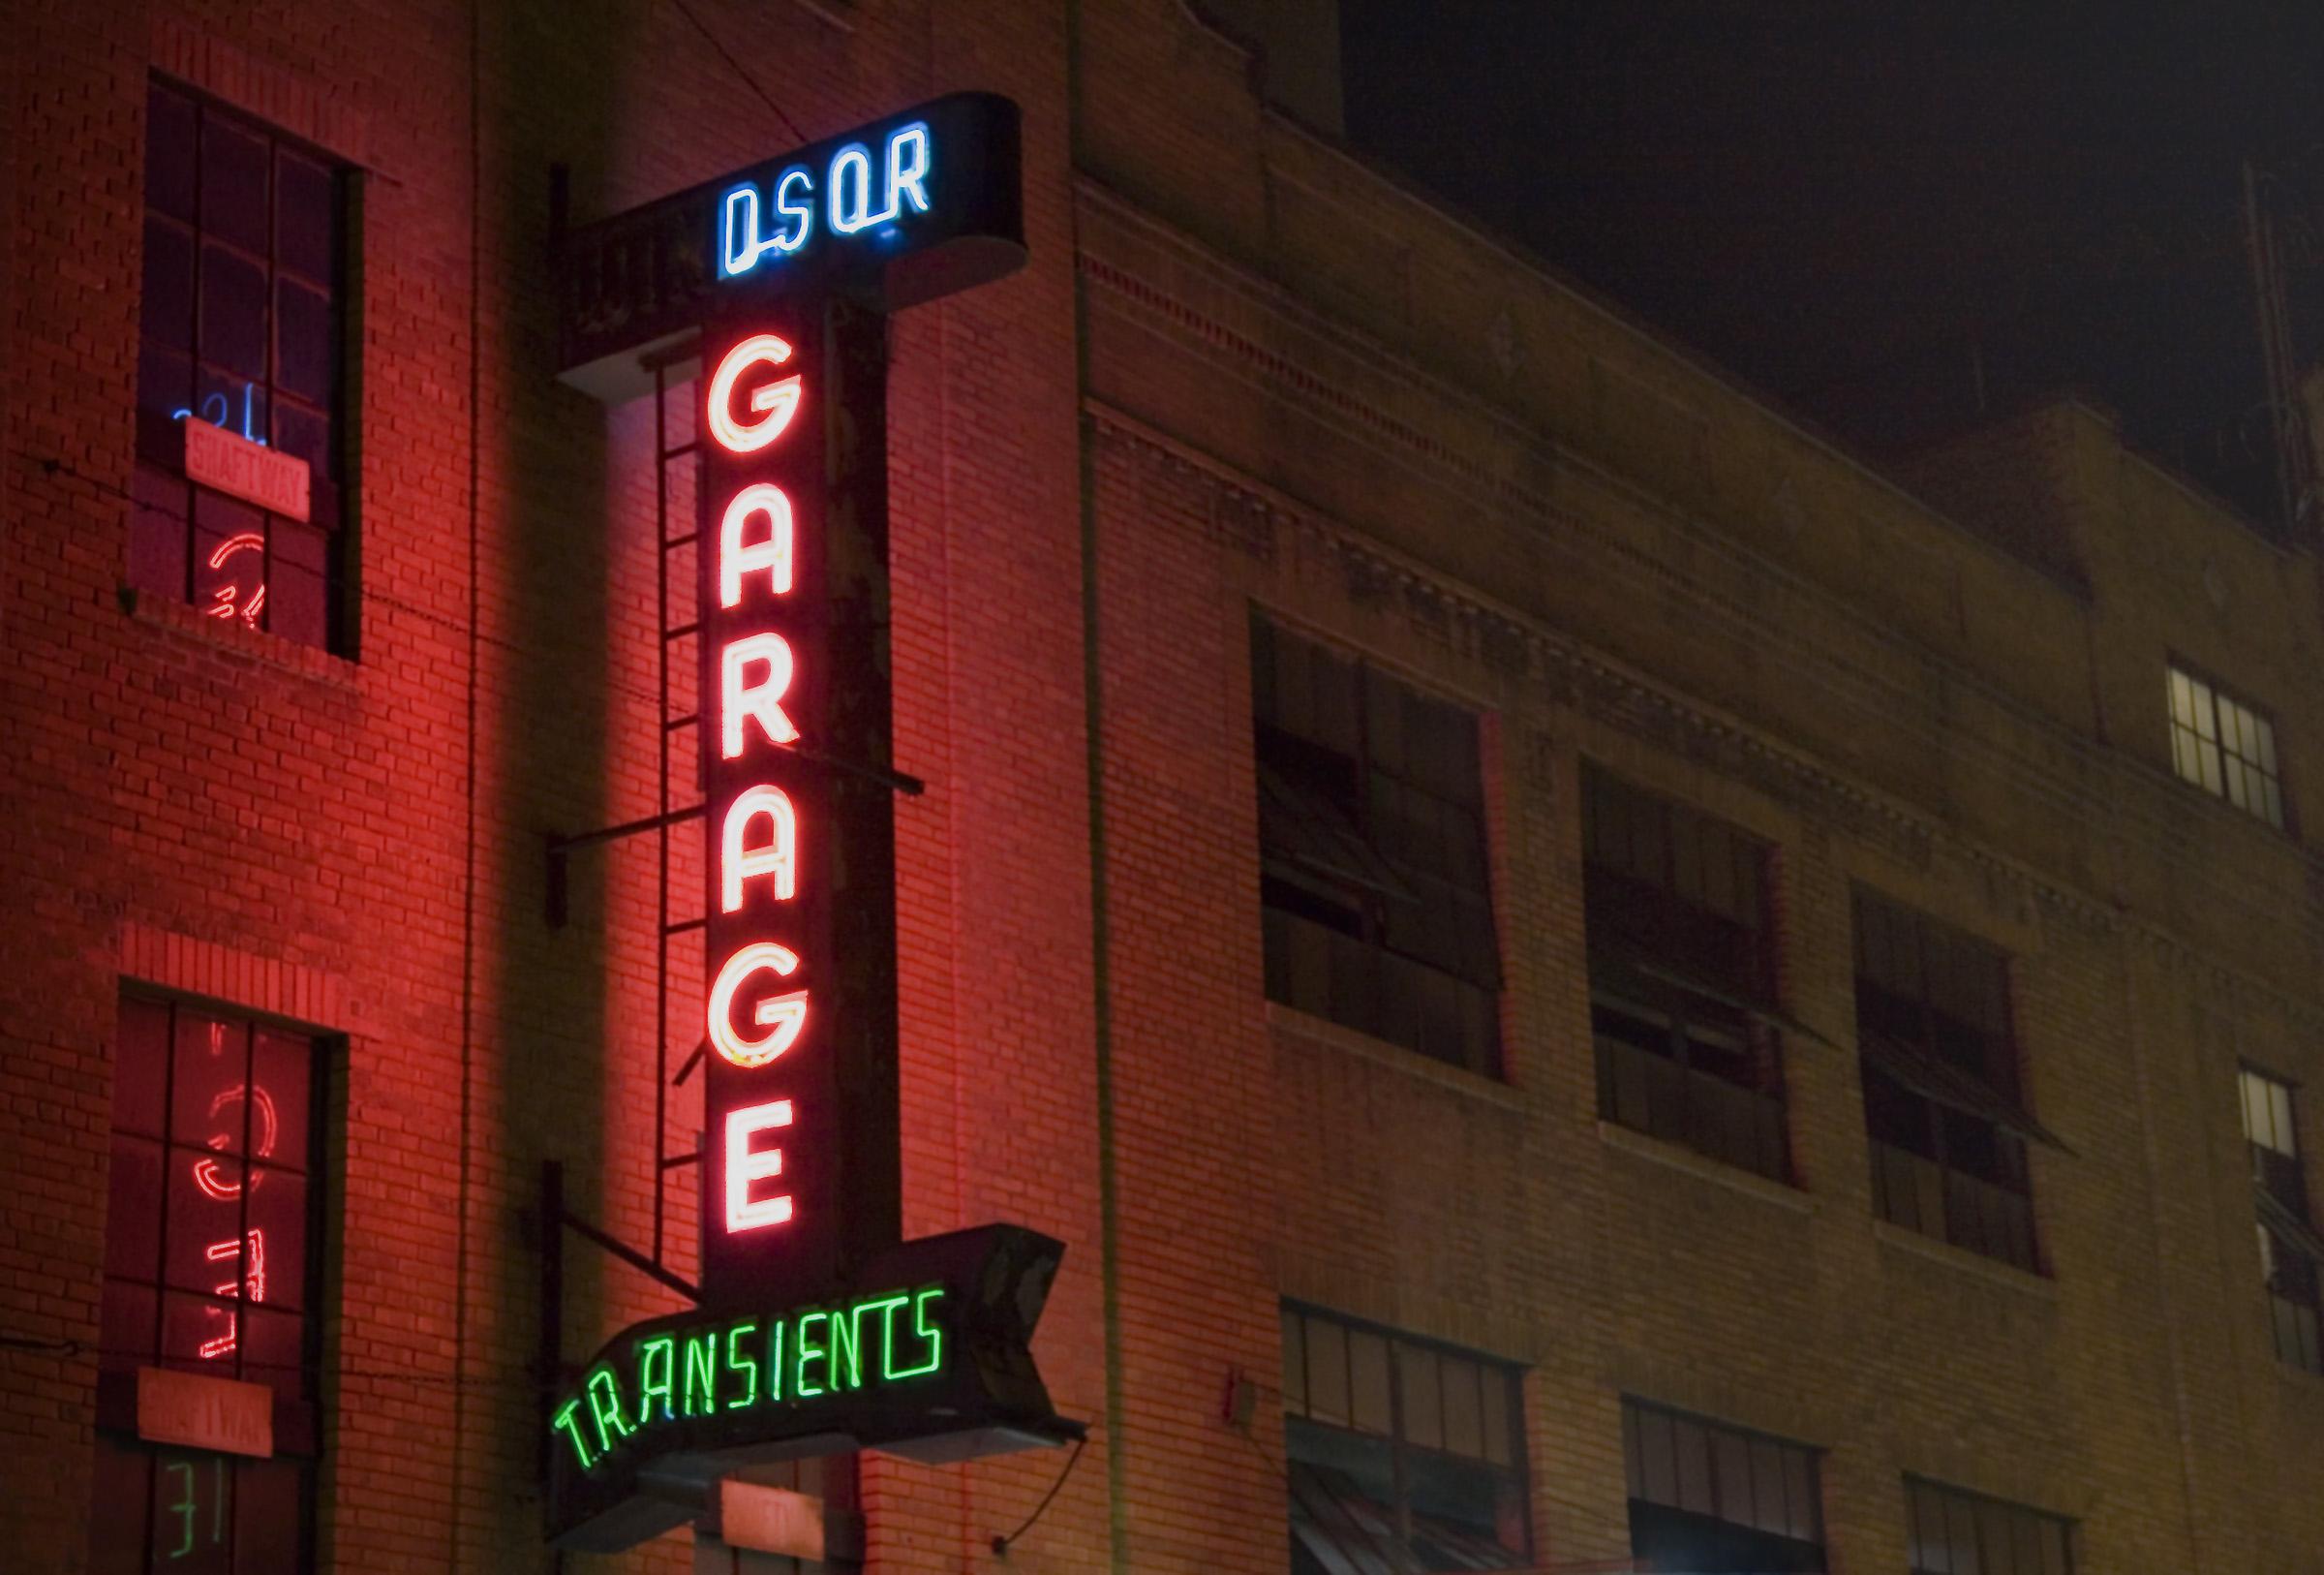 garage copy.jpg